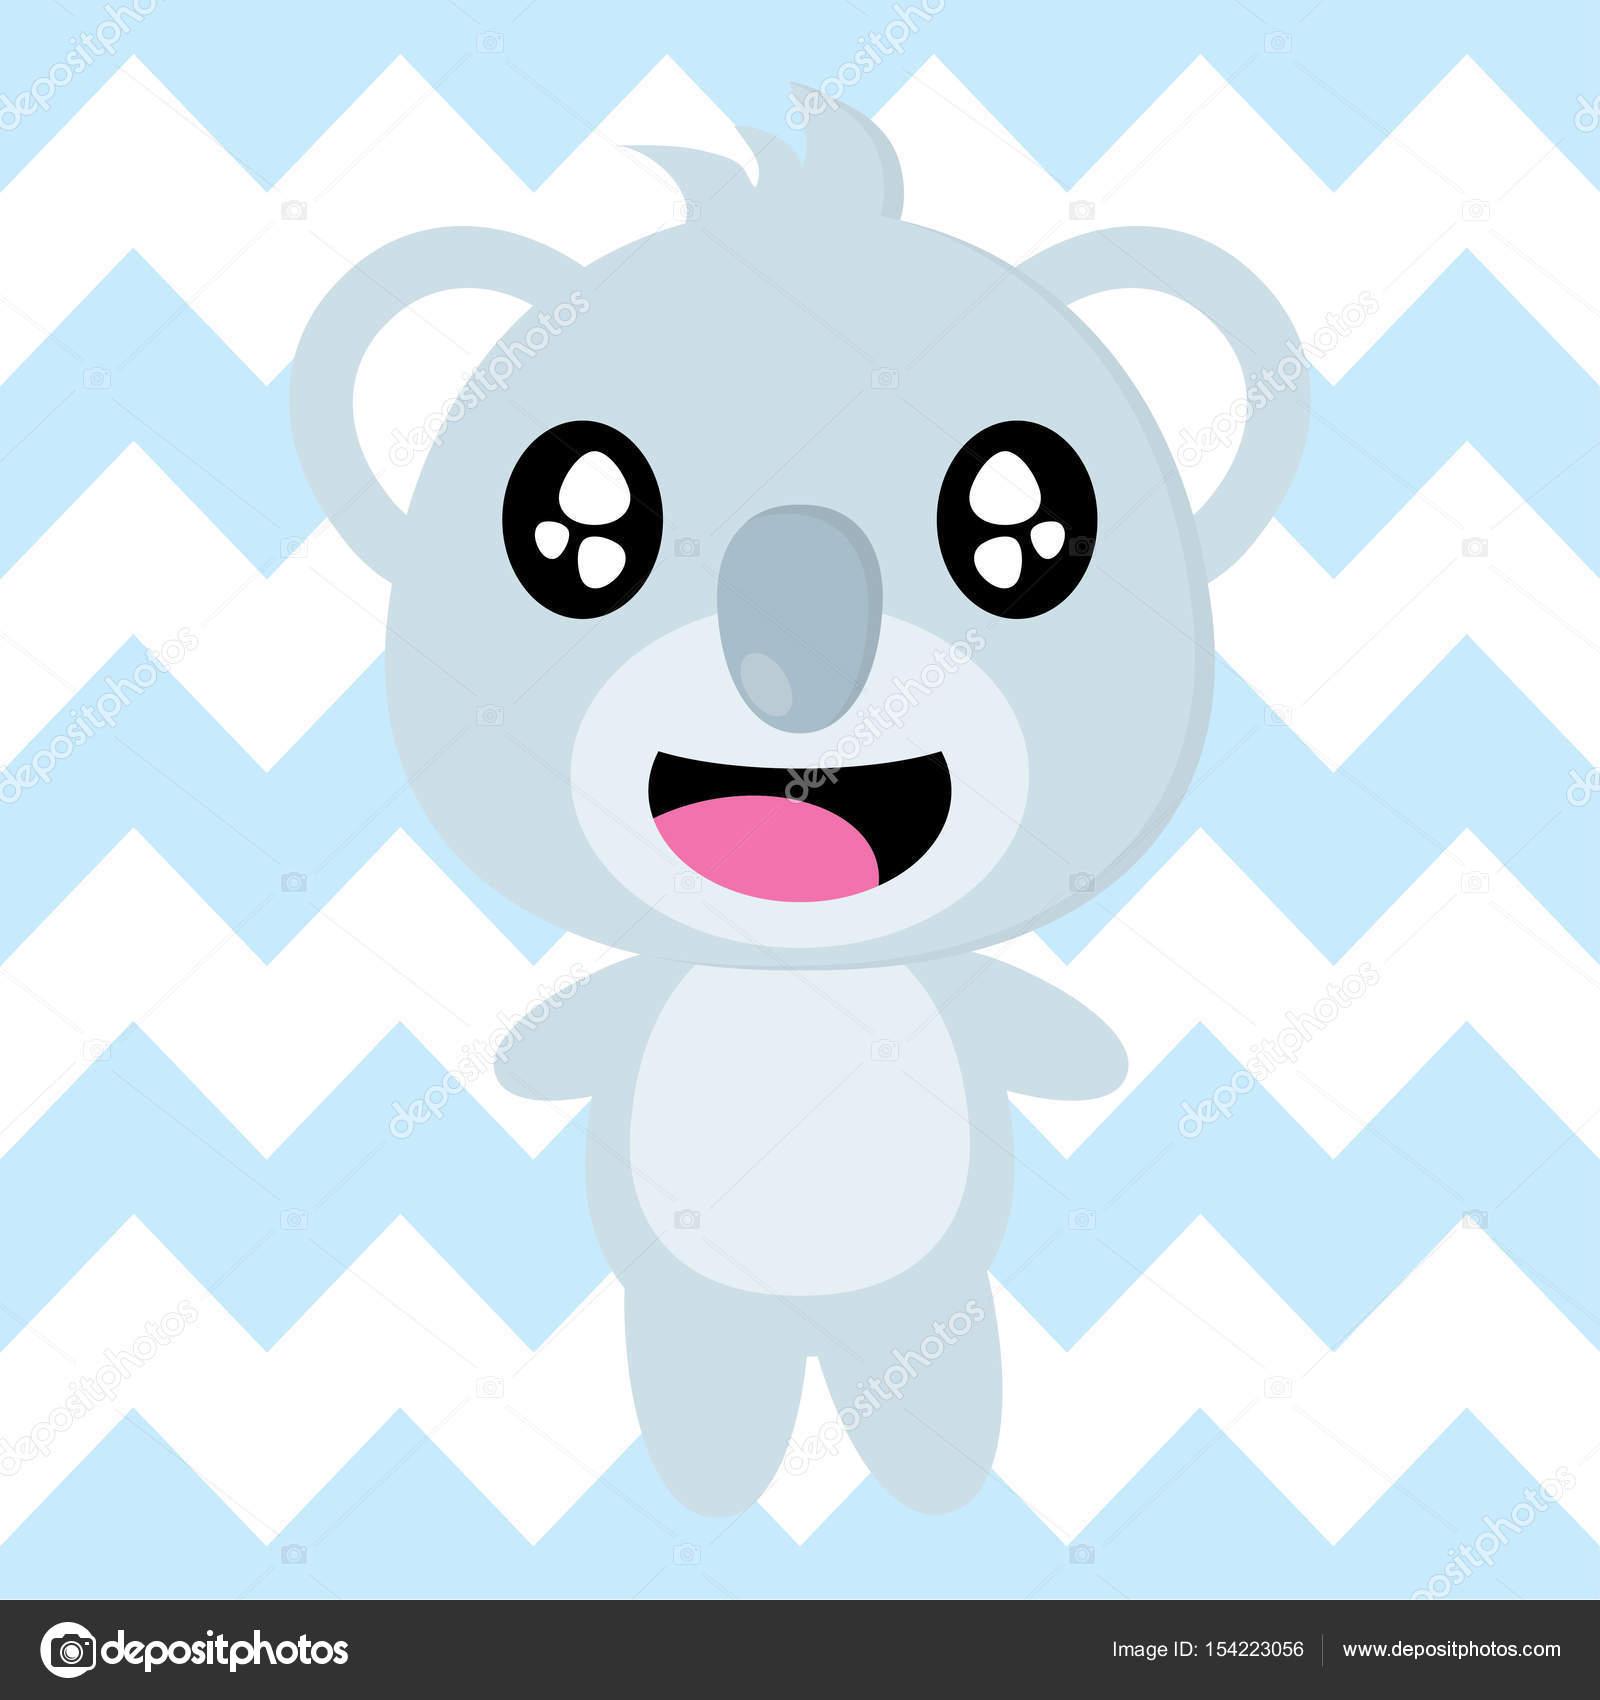 Download Wallpaper Koala Cartoon - depositphotos_154223056-stock-illustration-cute-koala-is-happy-on  Picture_431142   .jpg